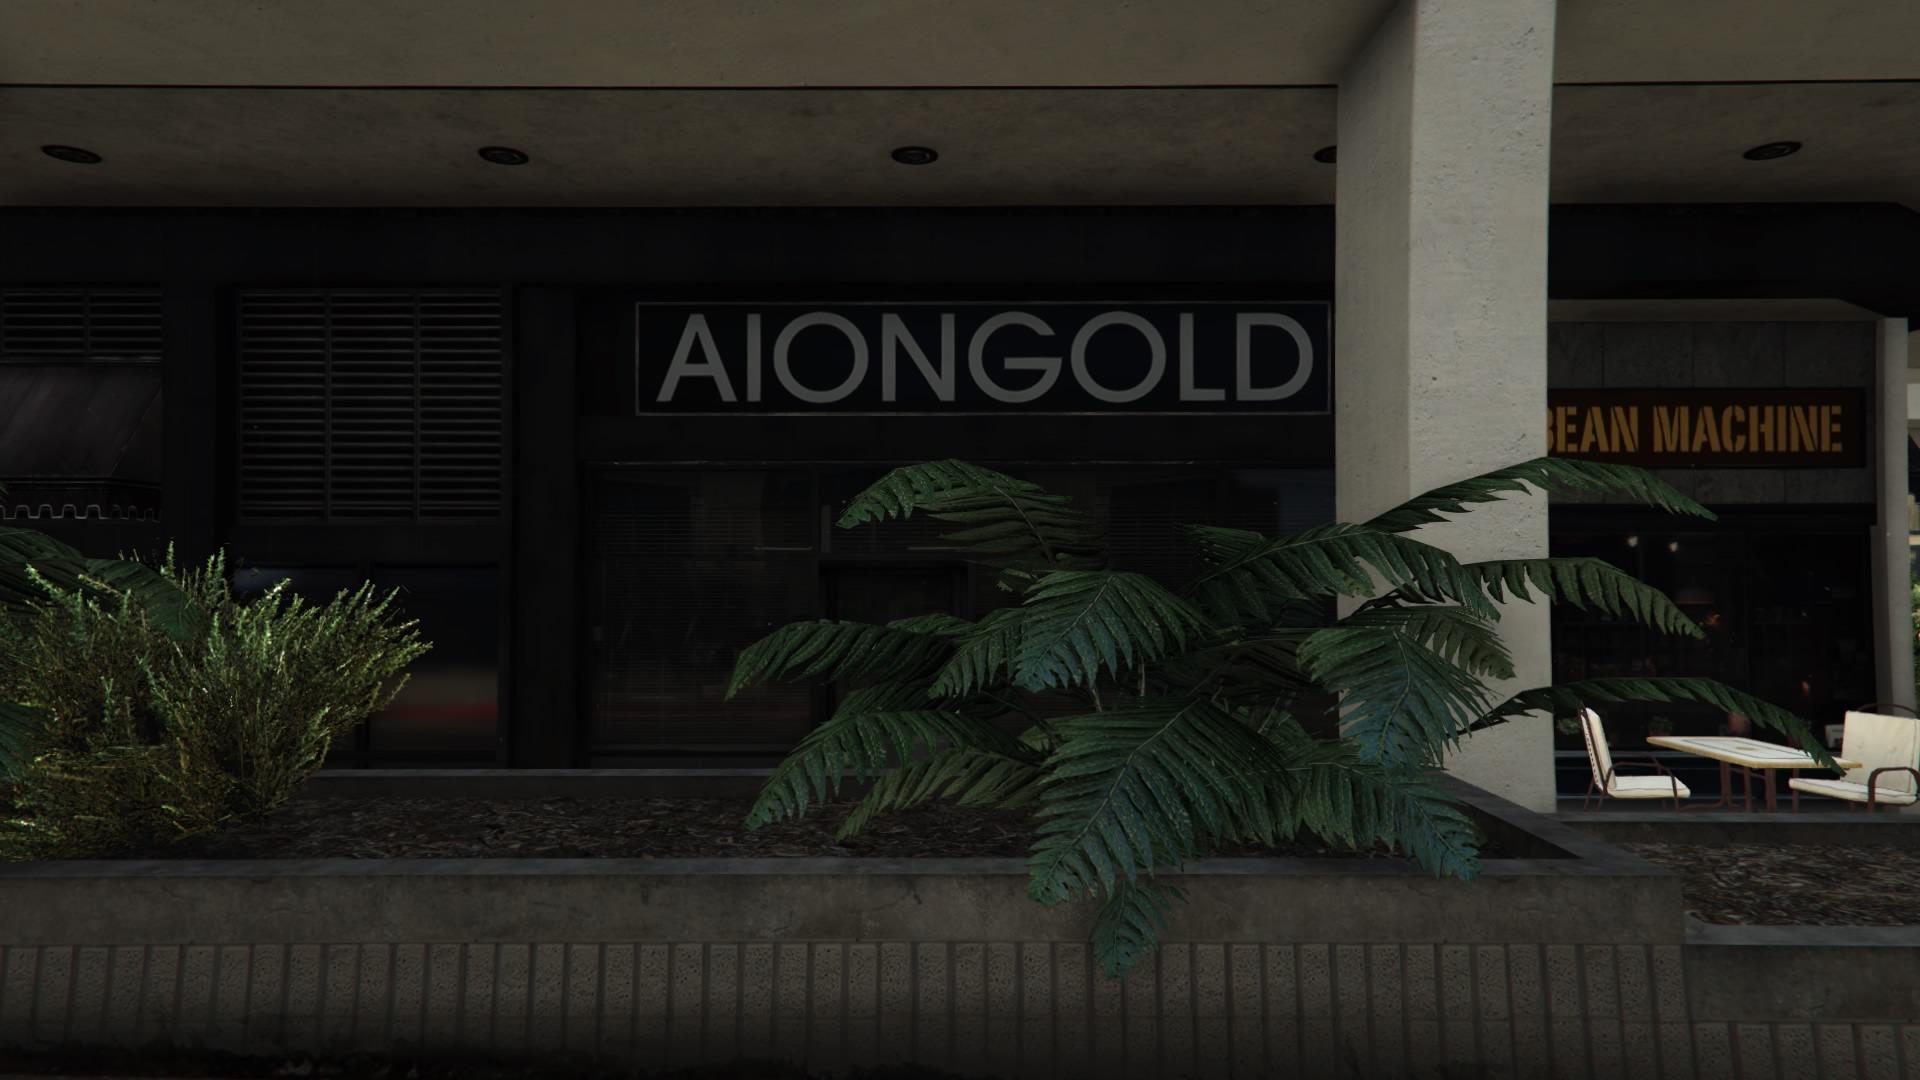 Aiongold